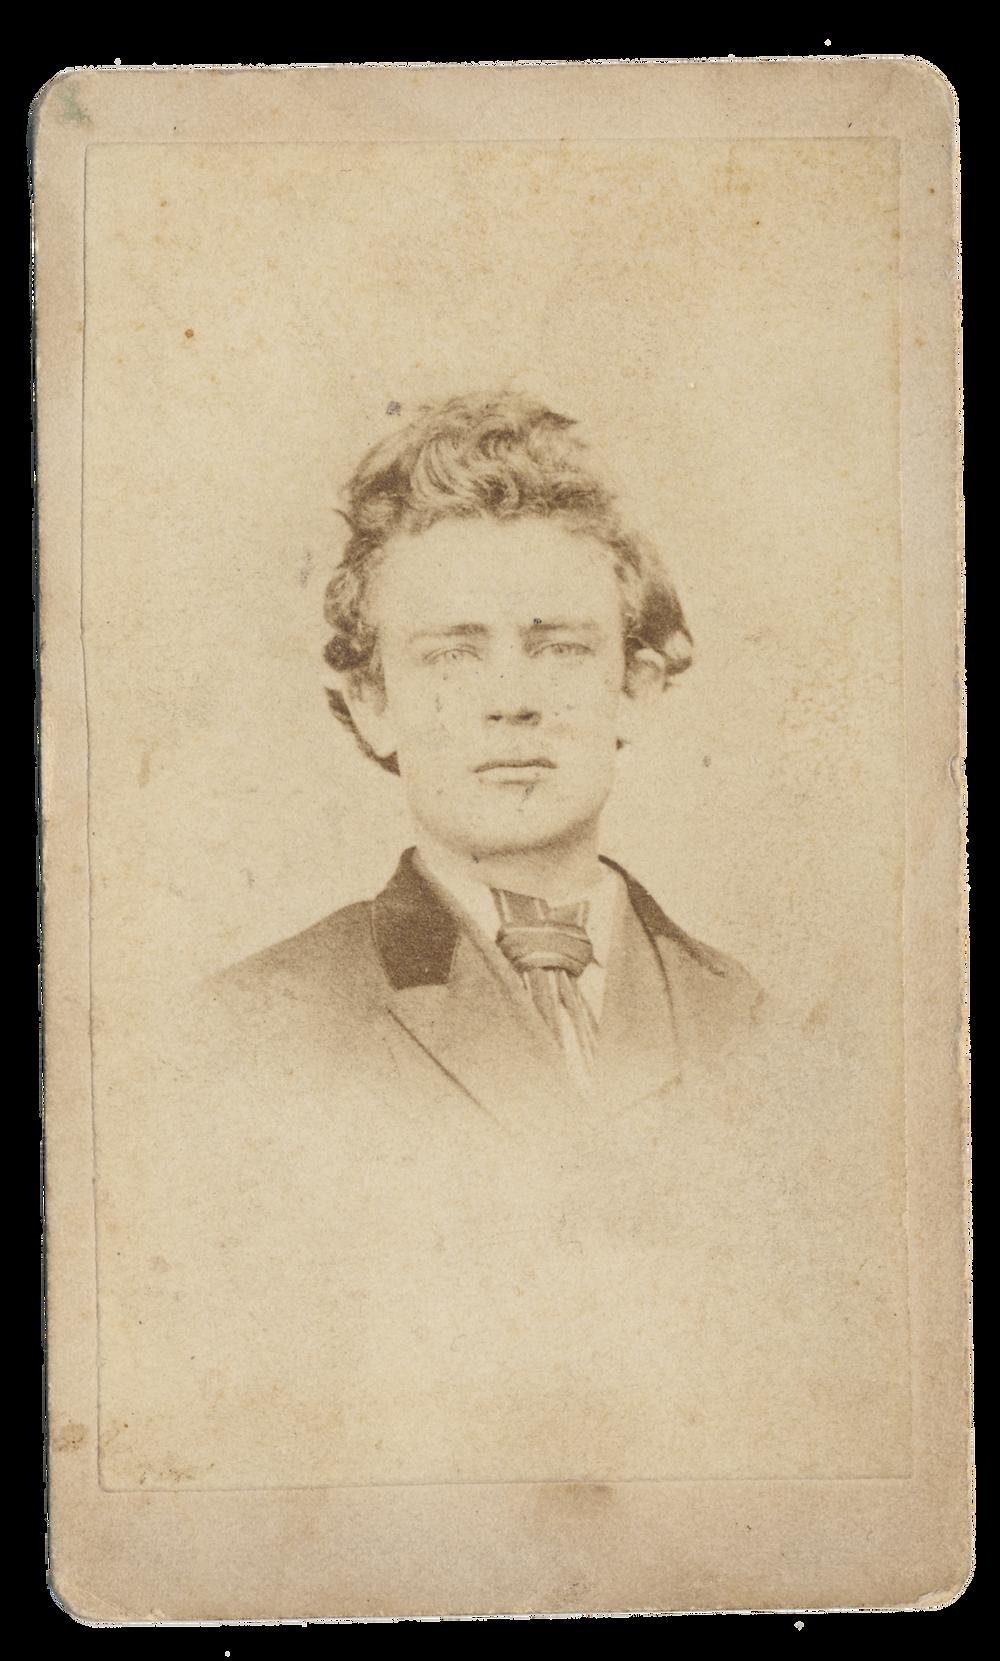 American gentleman also, c. 1850s - 1890s, original carte de visite | Purchased 2011, Stuart Archive.